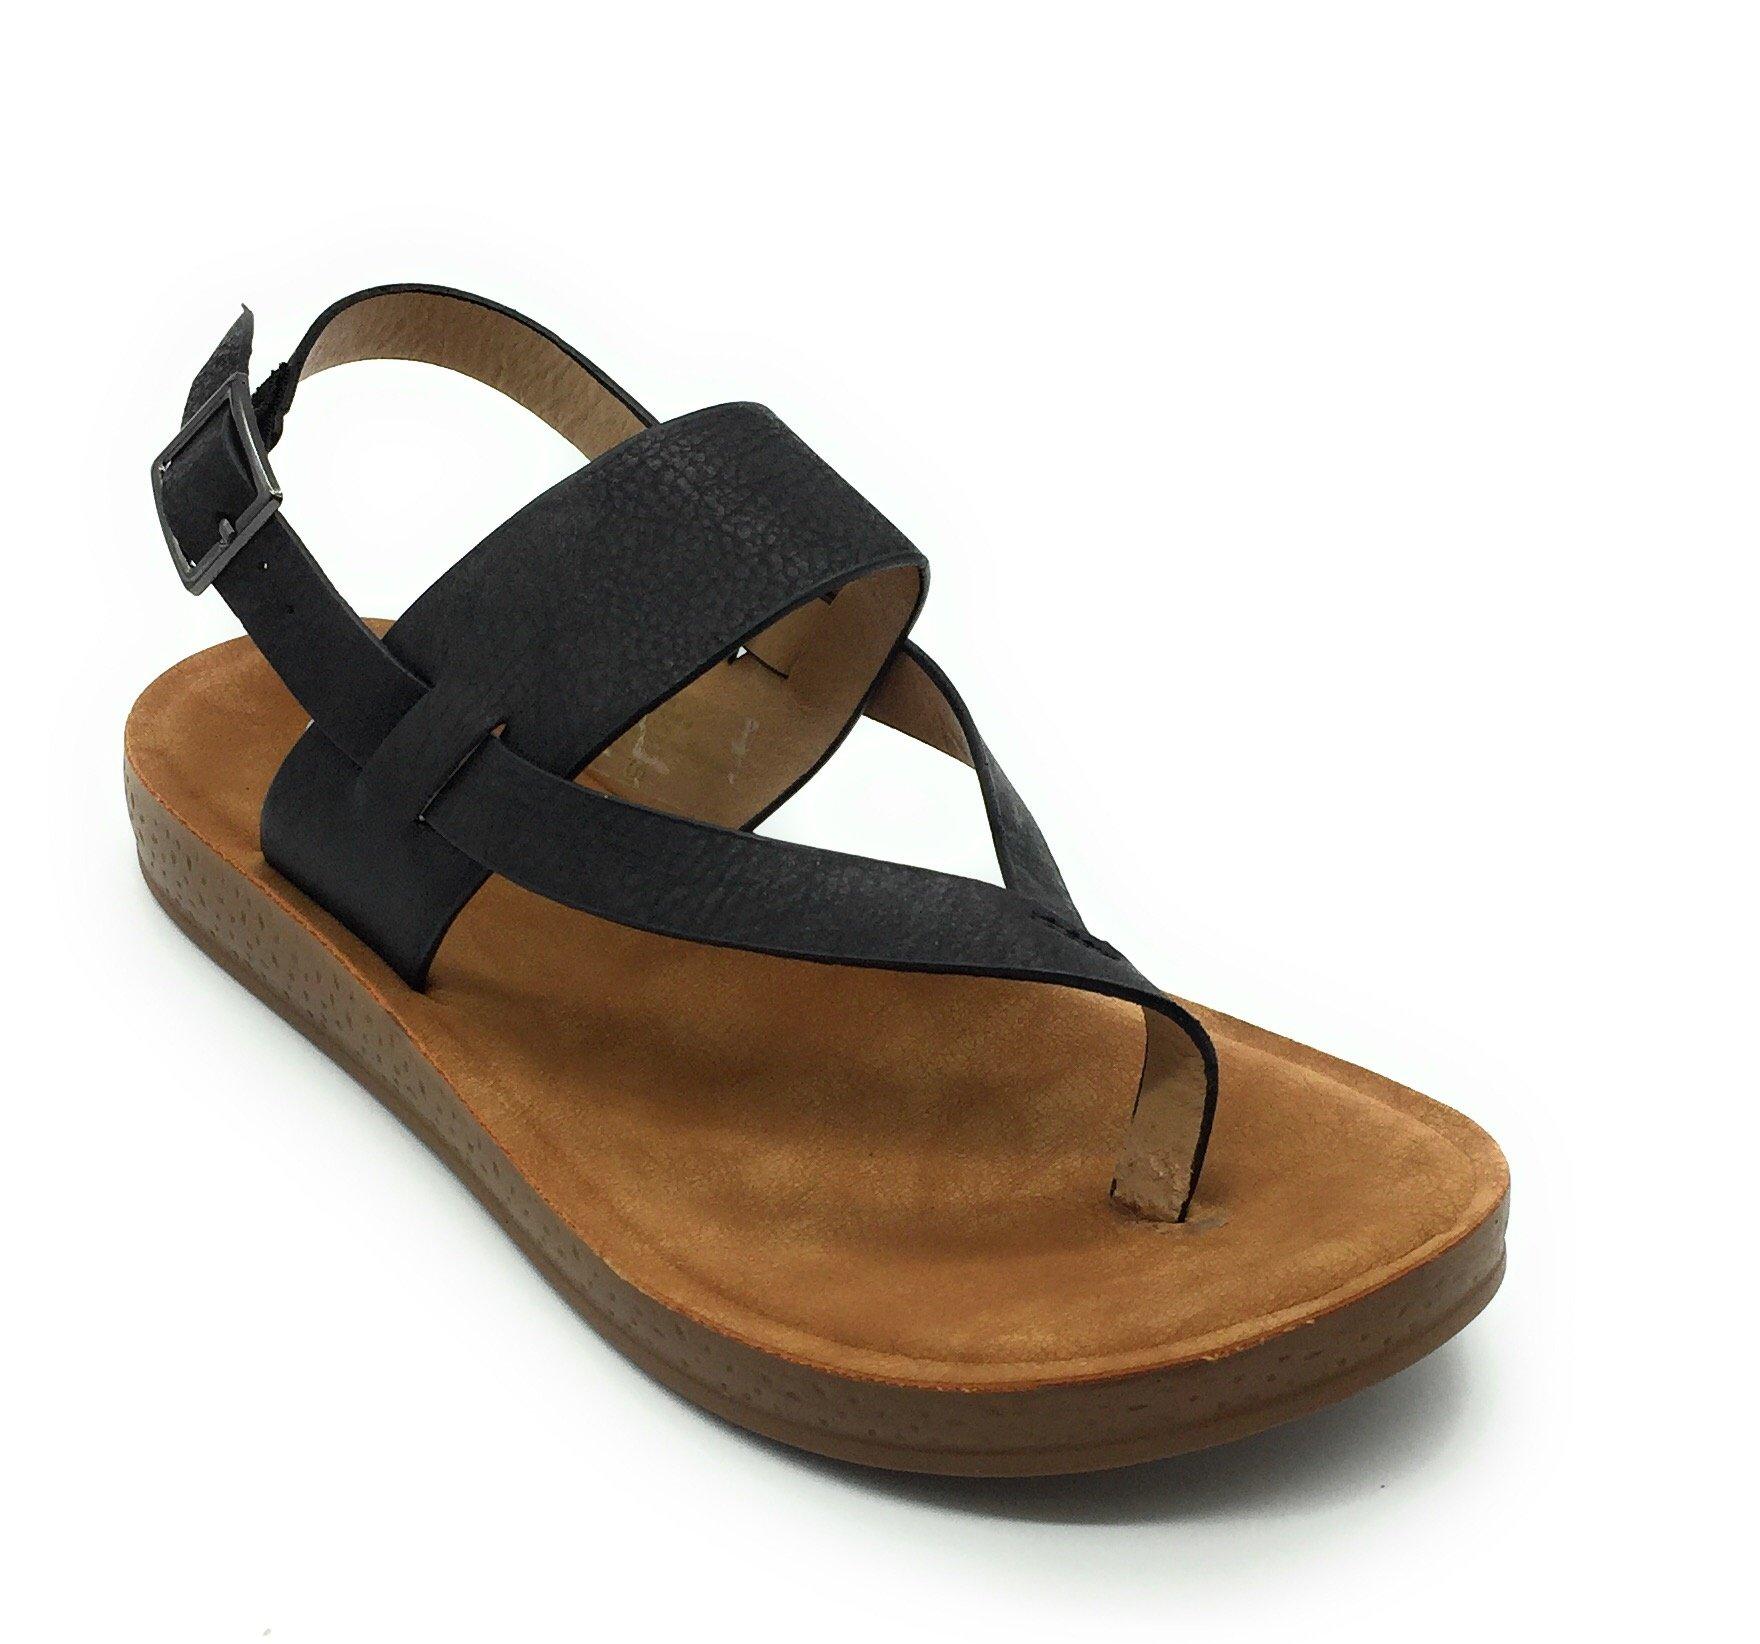 Women Cute Open Toe Comfortable Ankle Strap Platform Wedge Stylish Flexible Summer Flat Sandal, Black 8(M) US